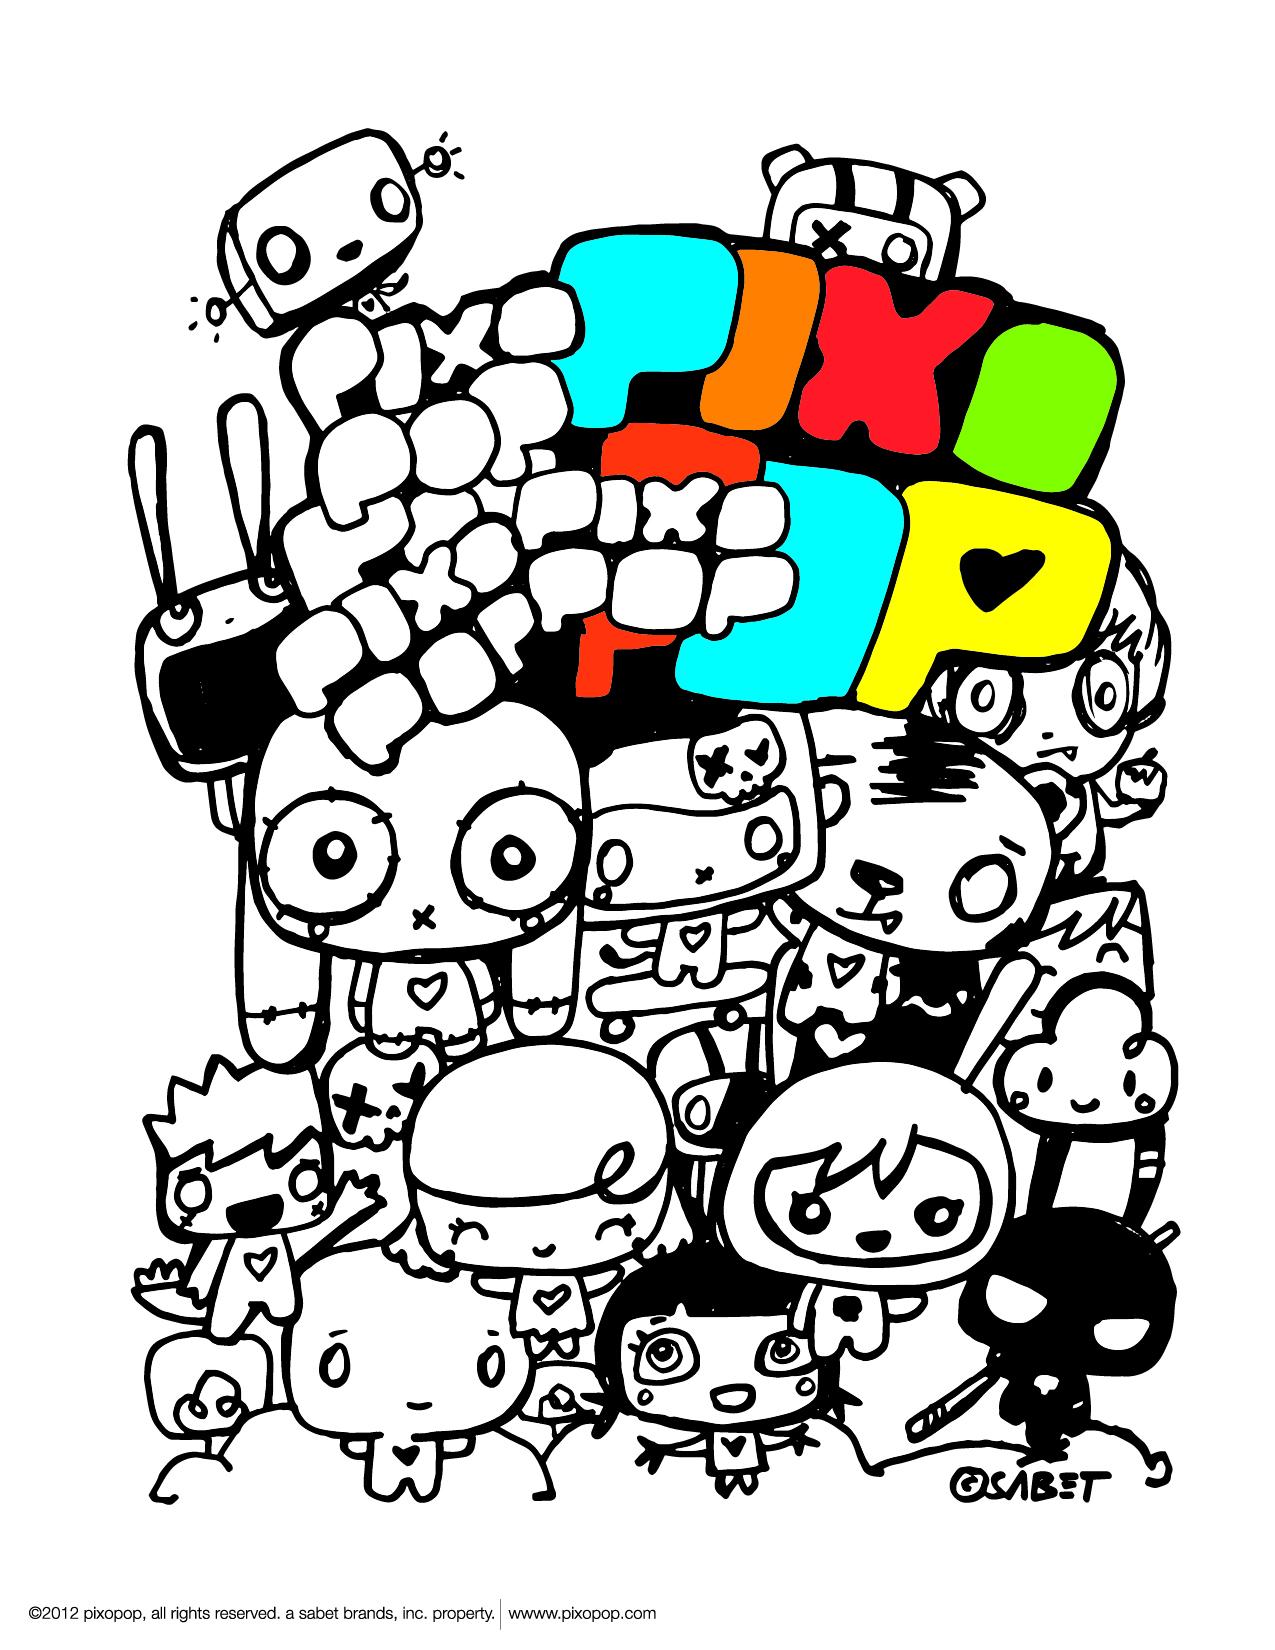 pp_color_book1-52.jpg